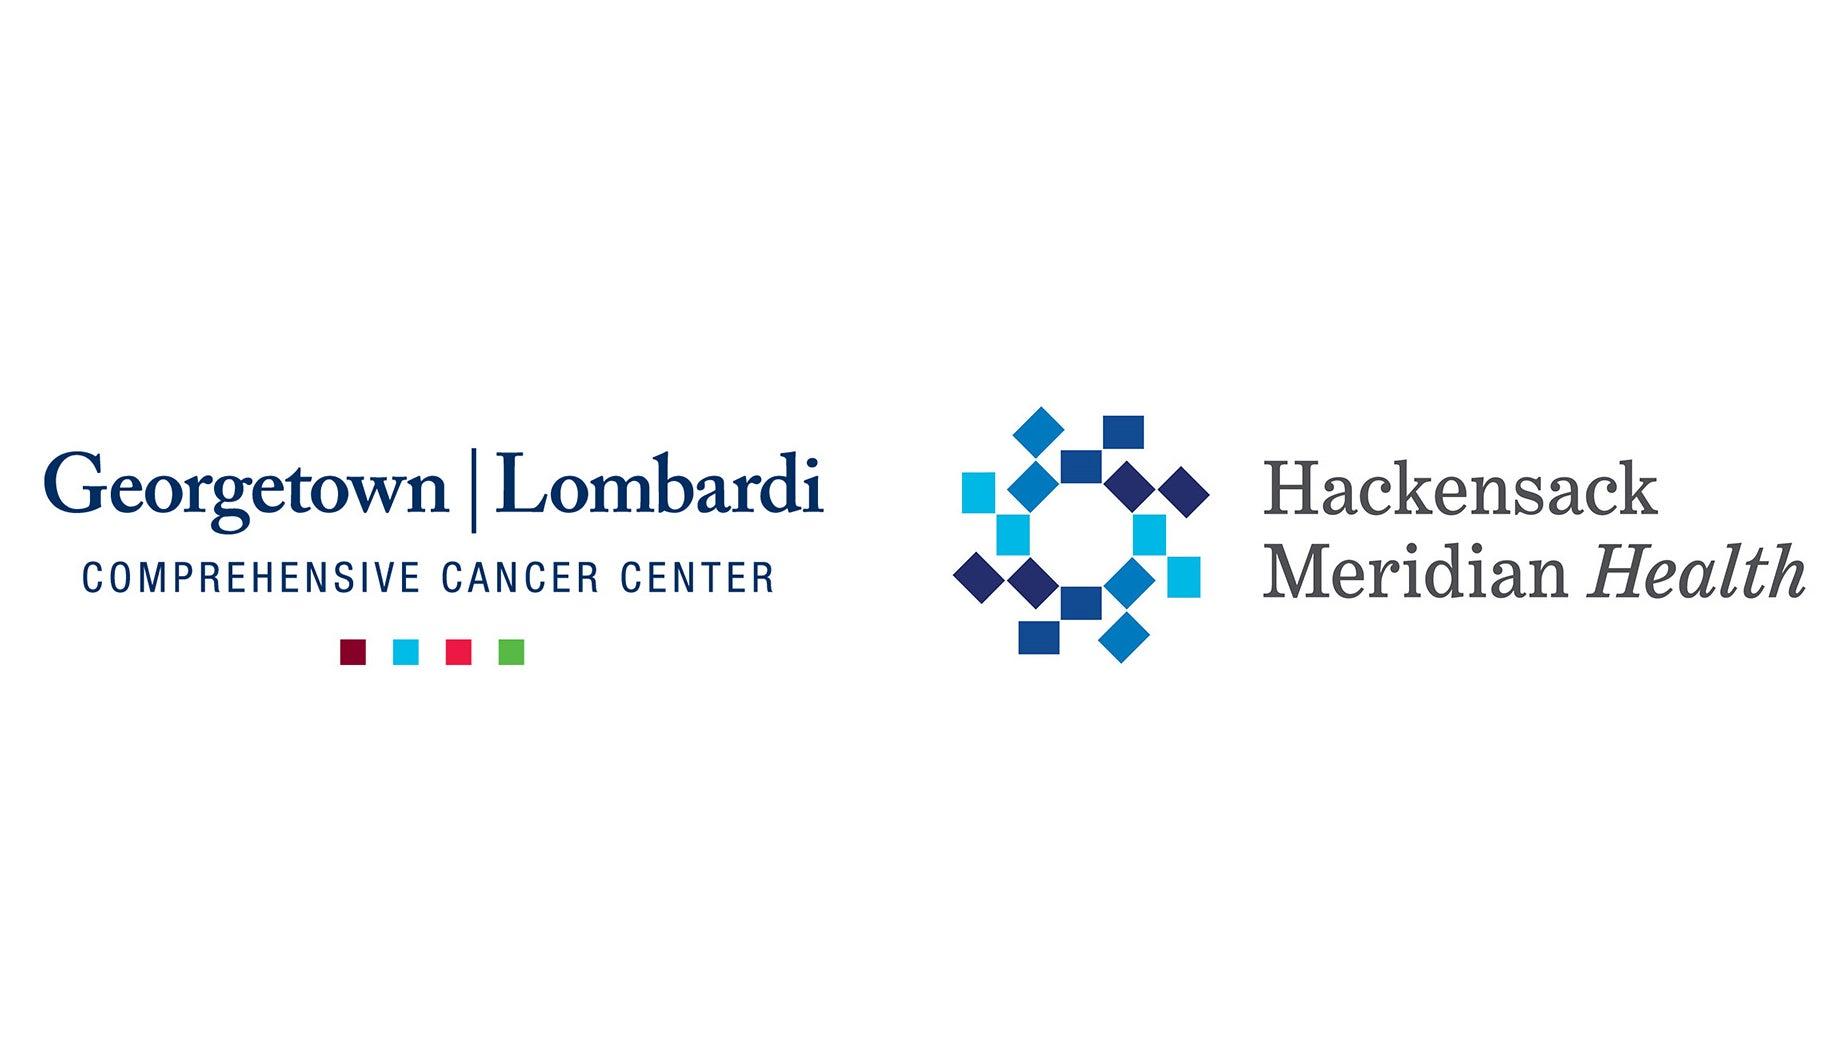 Georgetown Lombardi and Hackensack Meridian Health logos